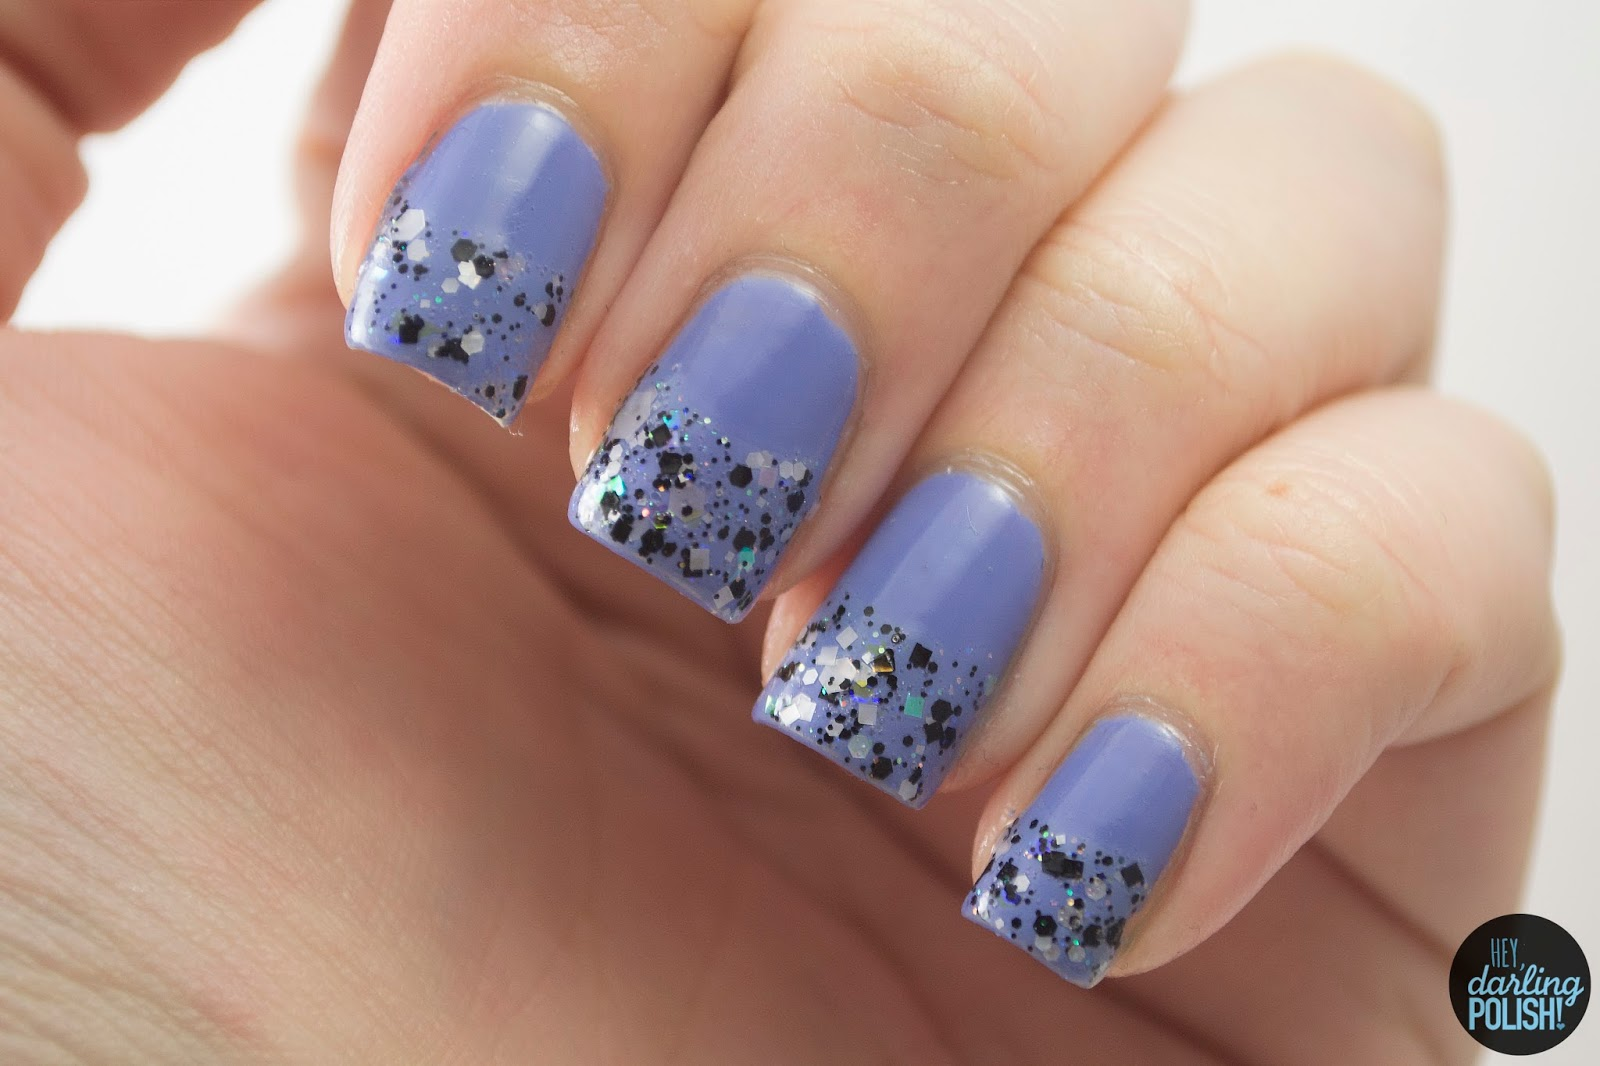 nails, nail art, nail polish, polish, indie, indie polish, indie nail polish, purple, hey darling polish, lynbdesigns, master, the neverending pile challenge